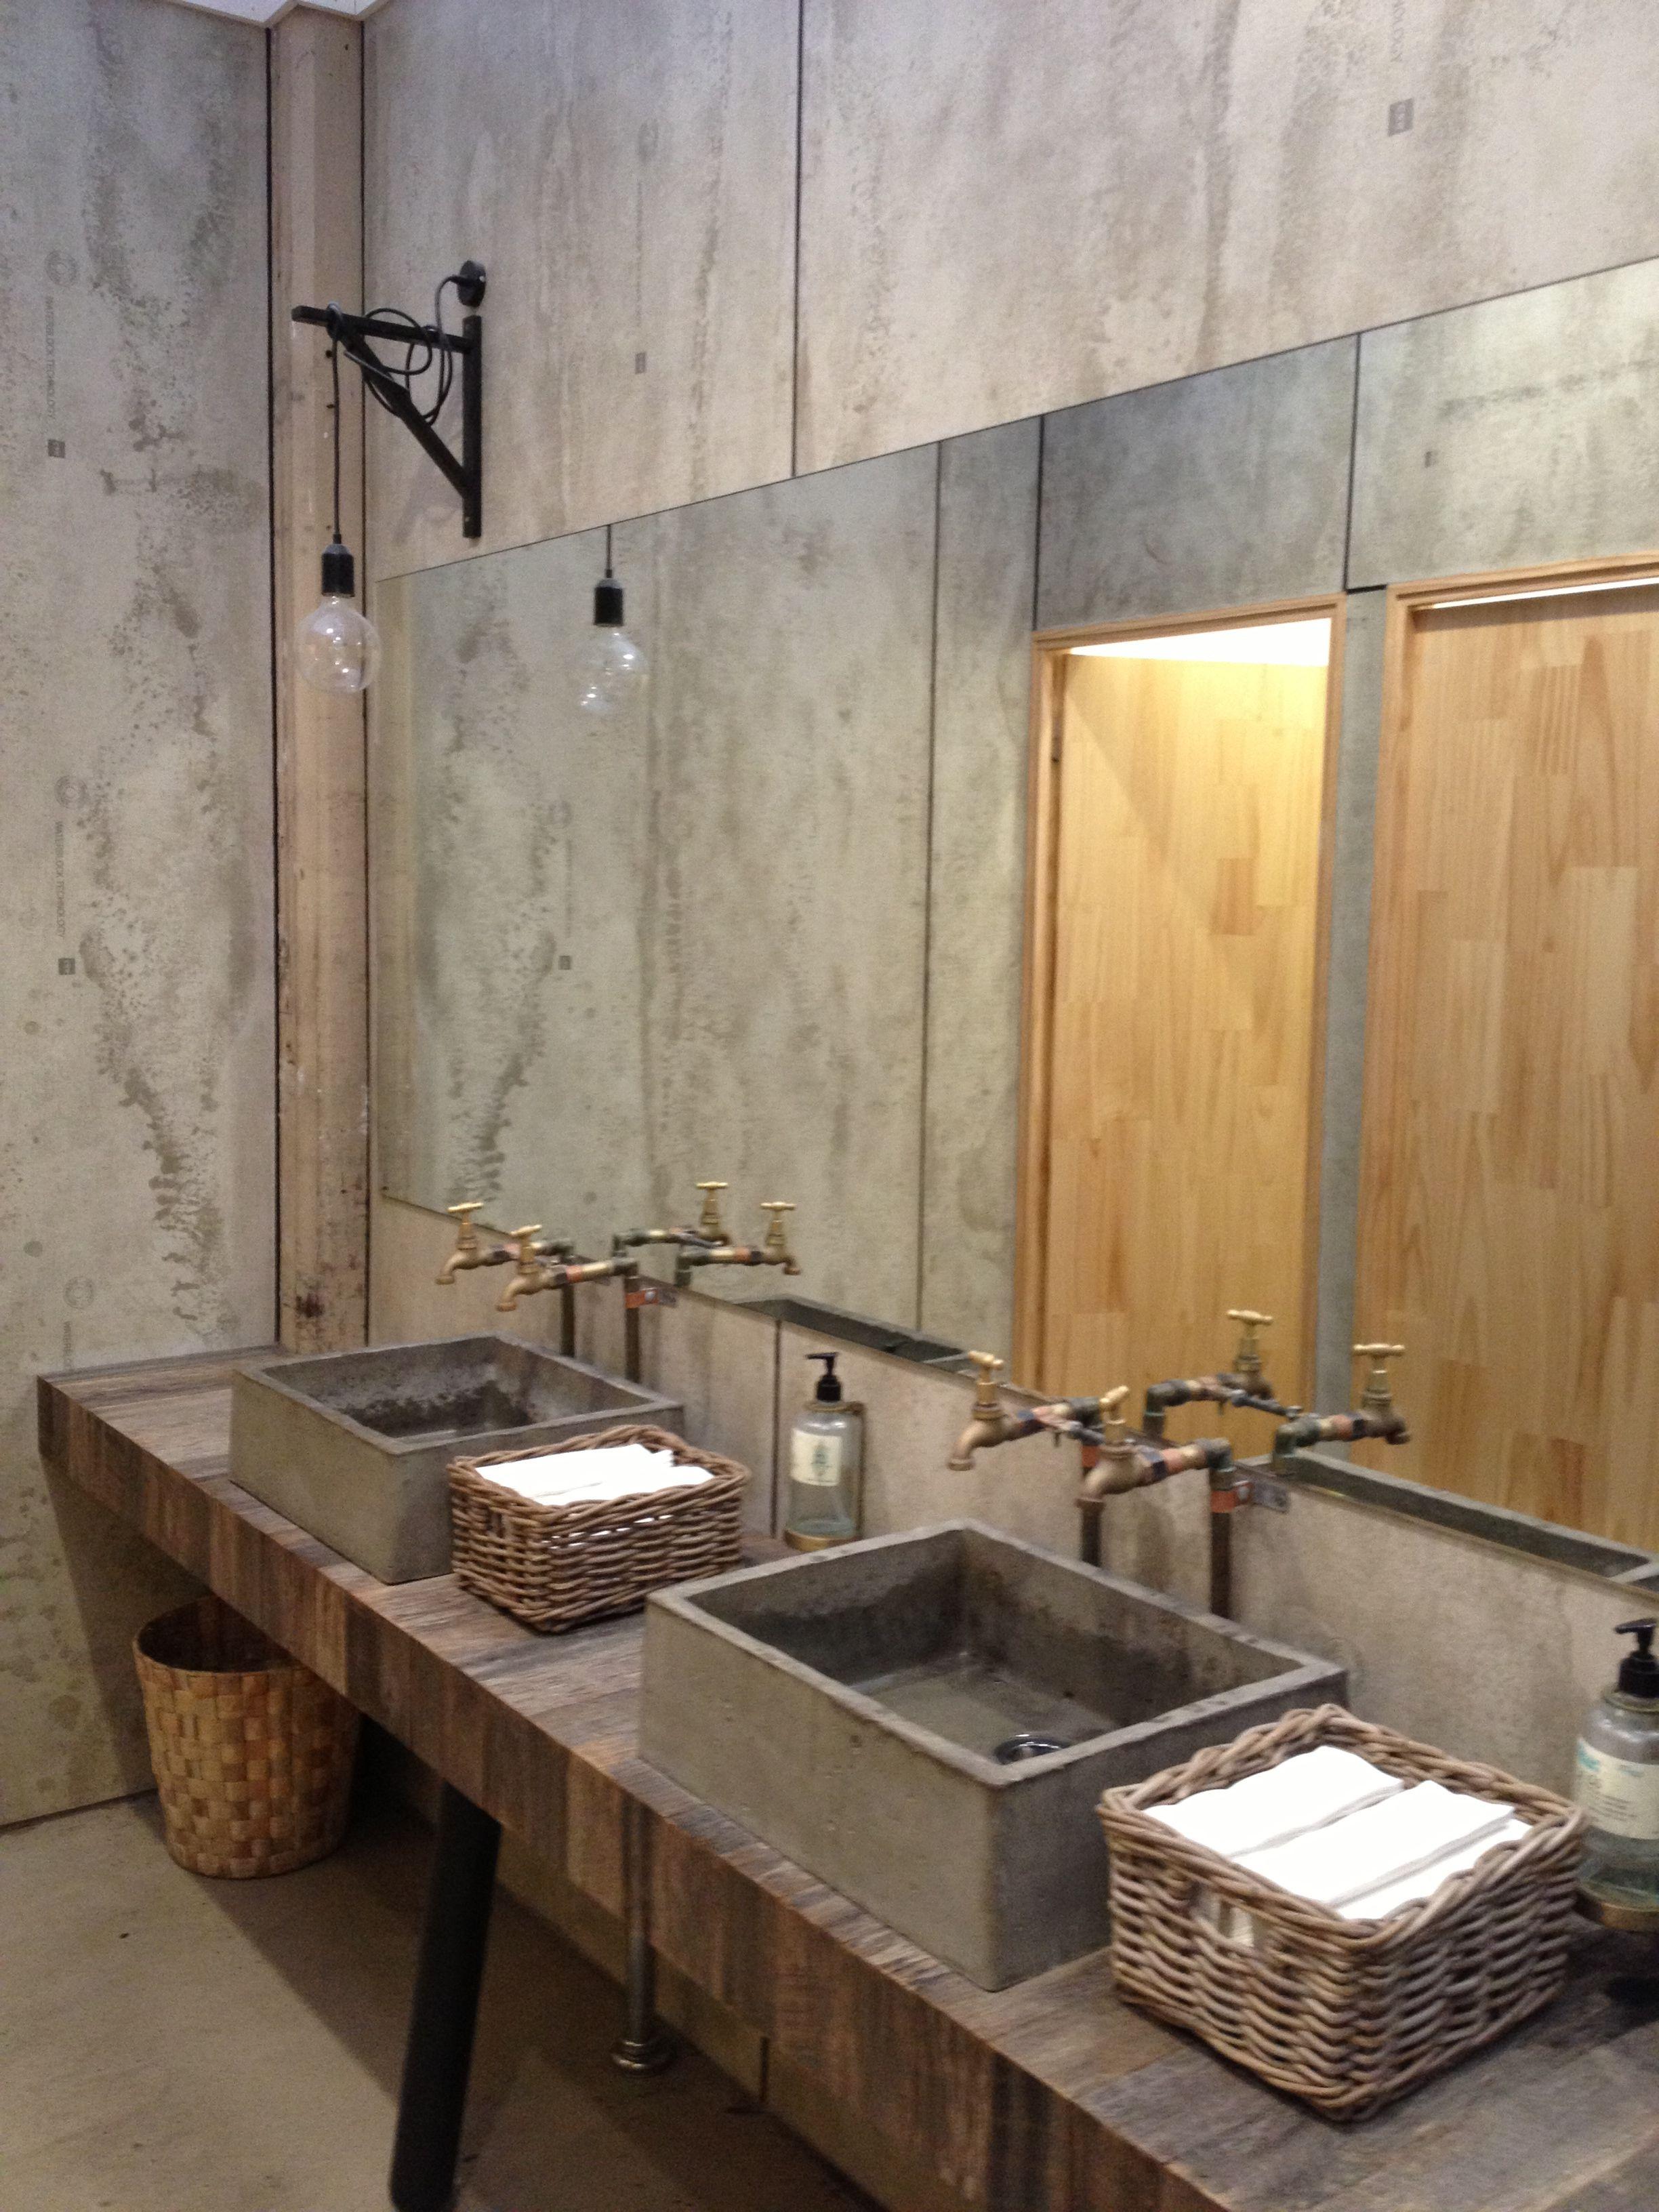 Interior Design Decoration Home Decor Bathroom Kitchen & Bath